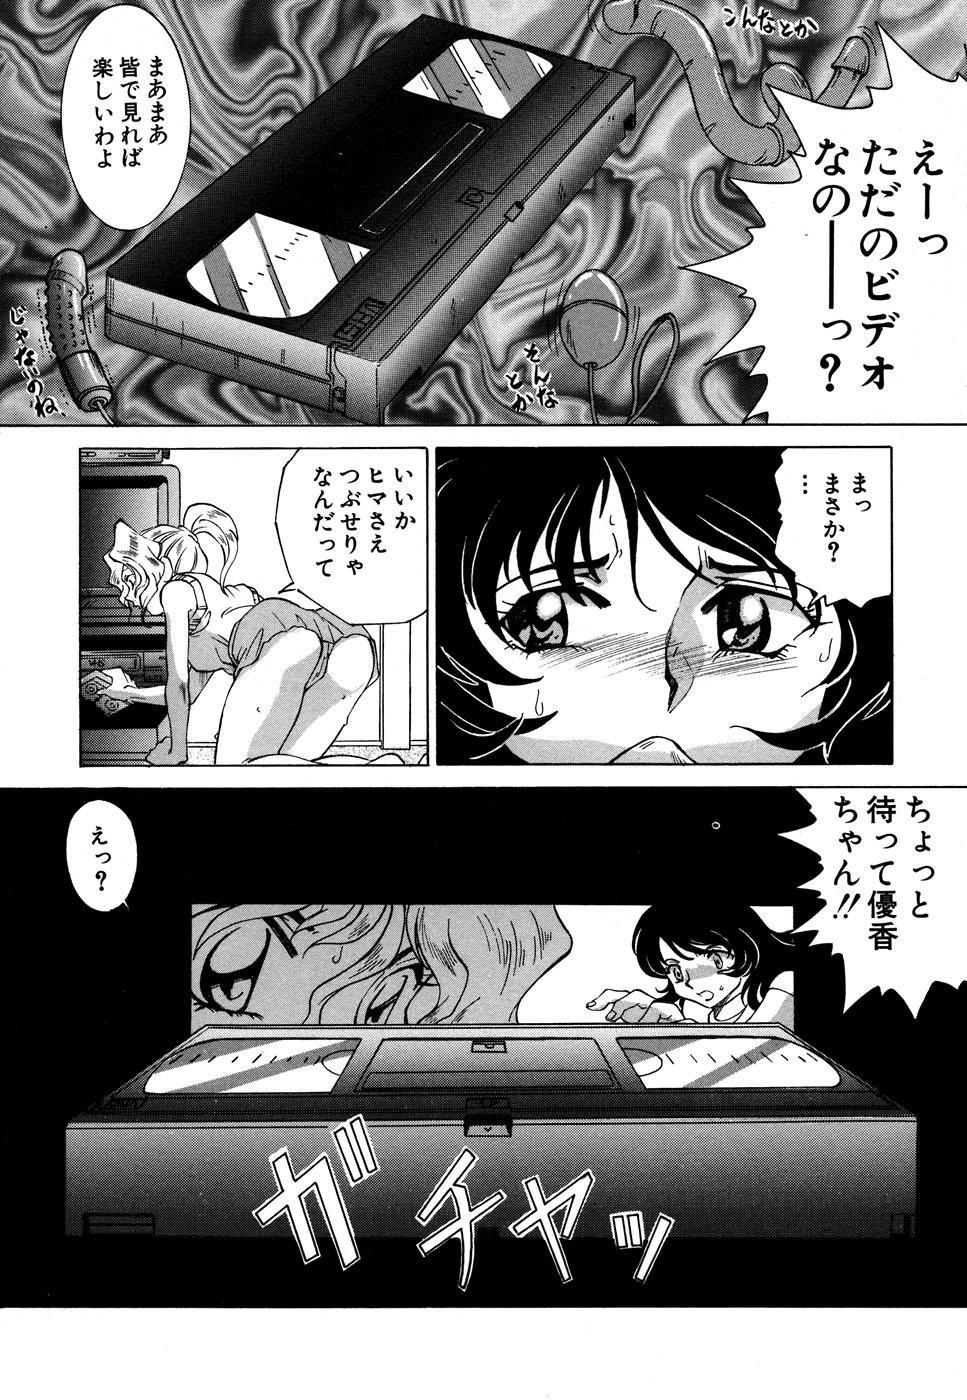 G-drive Vol.1 Ryoujokuhen 137